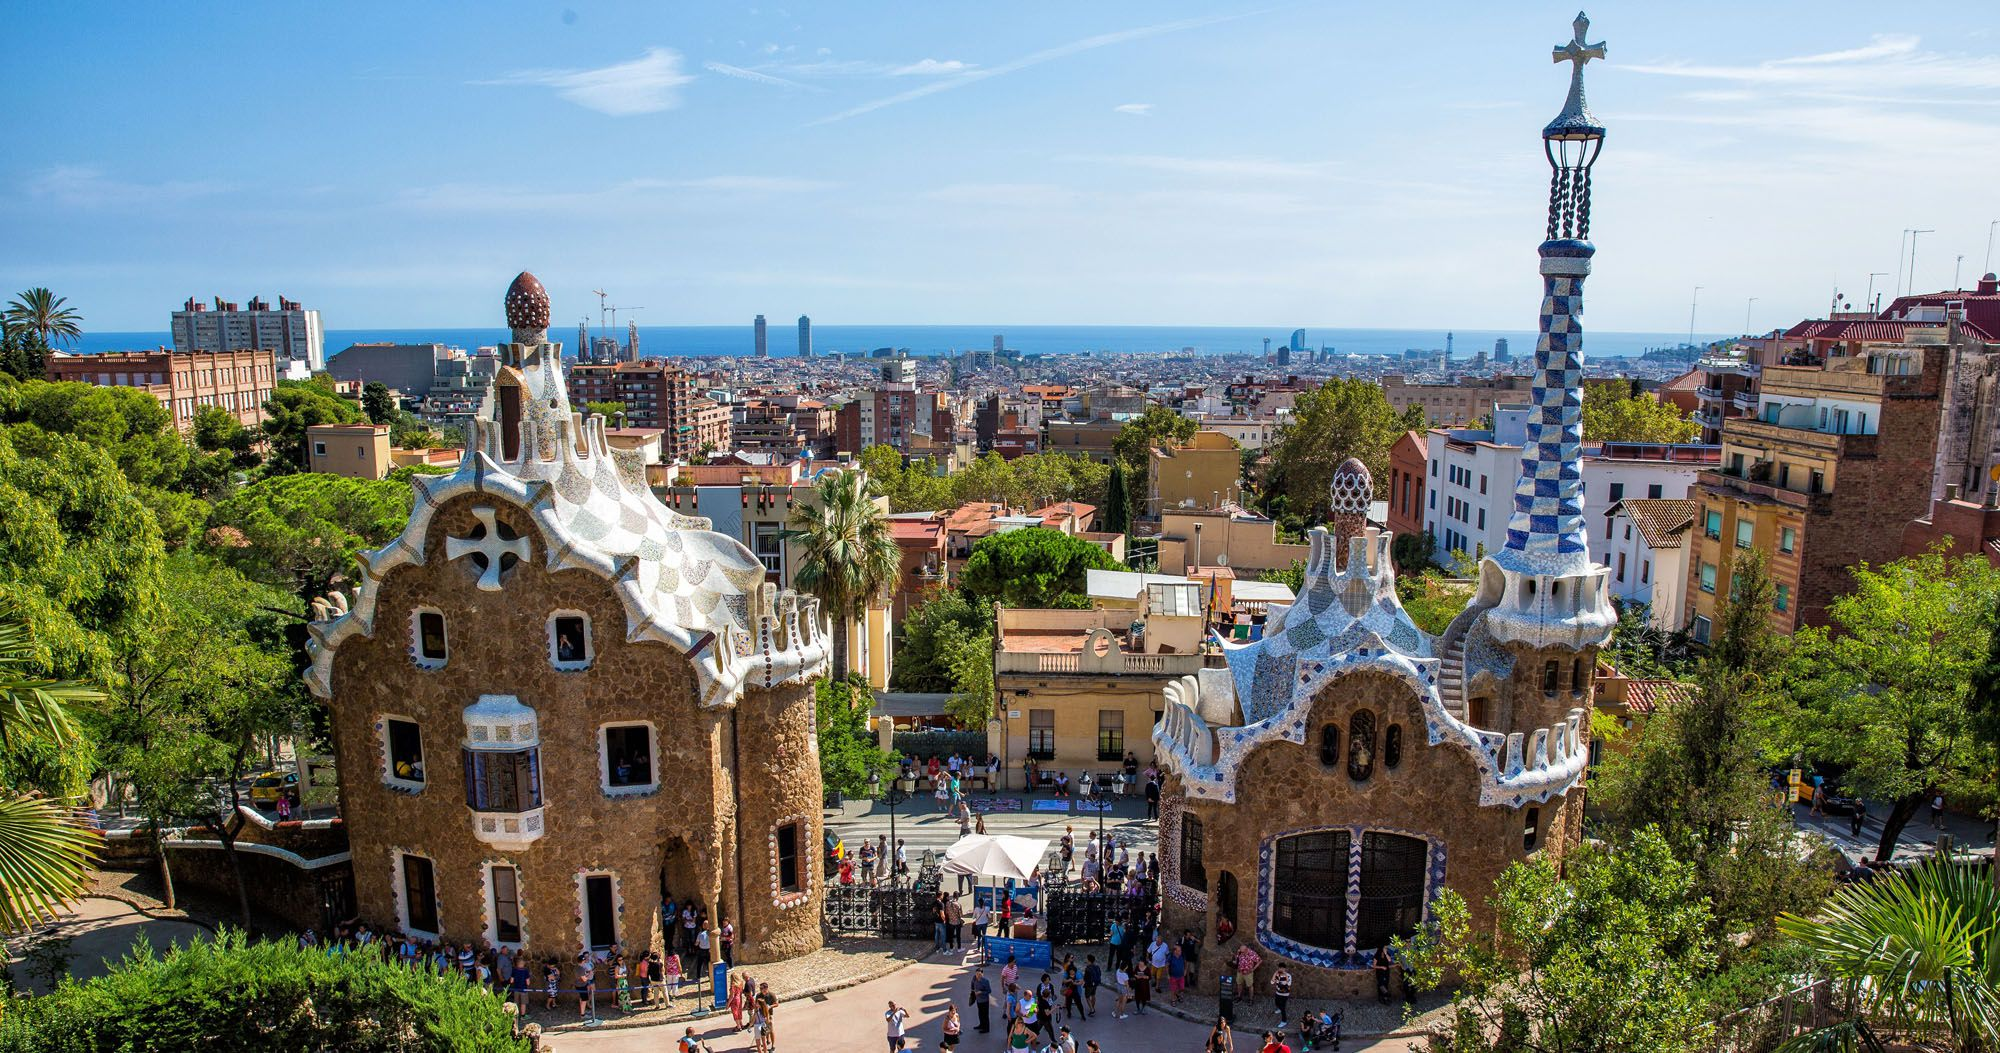 3 Day Barcelona Itinerary